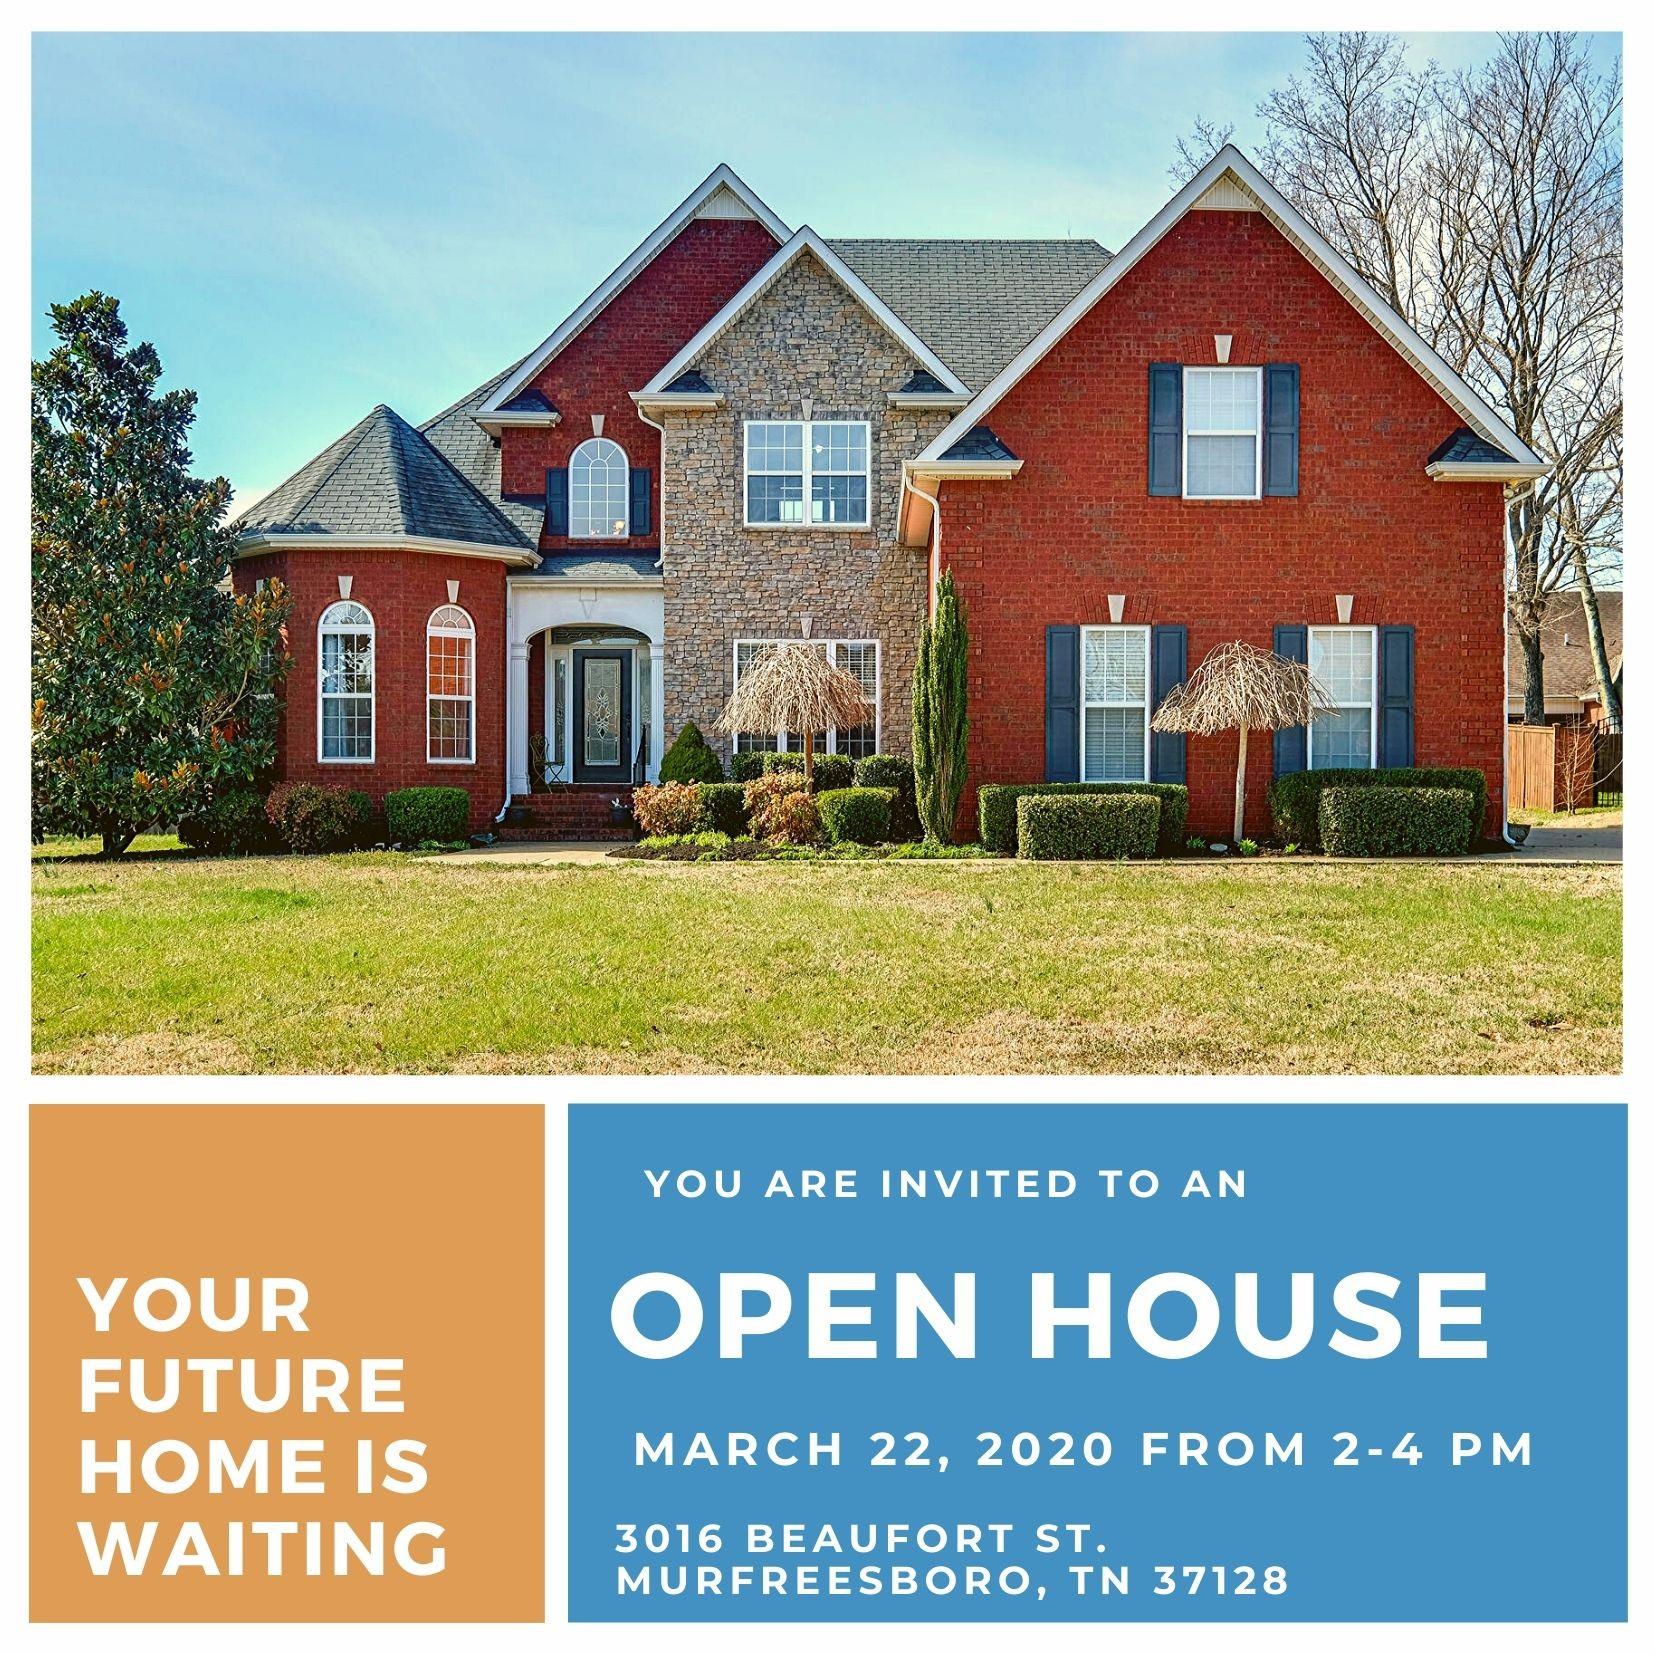 3016 Beaufort St Property Photo - Murfreesboro, TN real estate listing